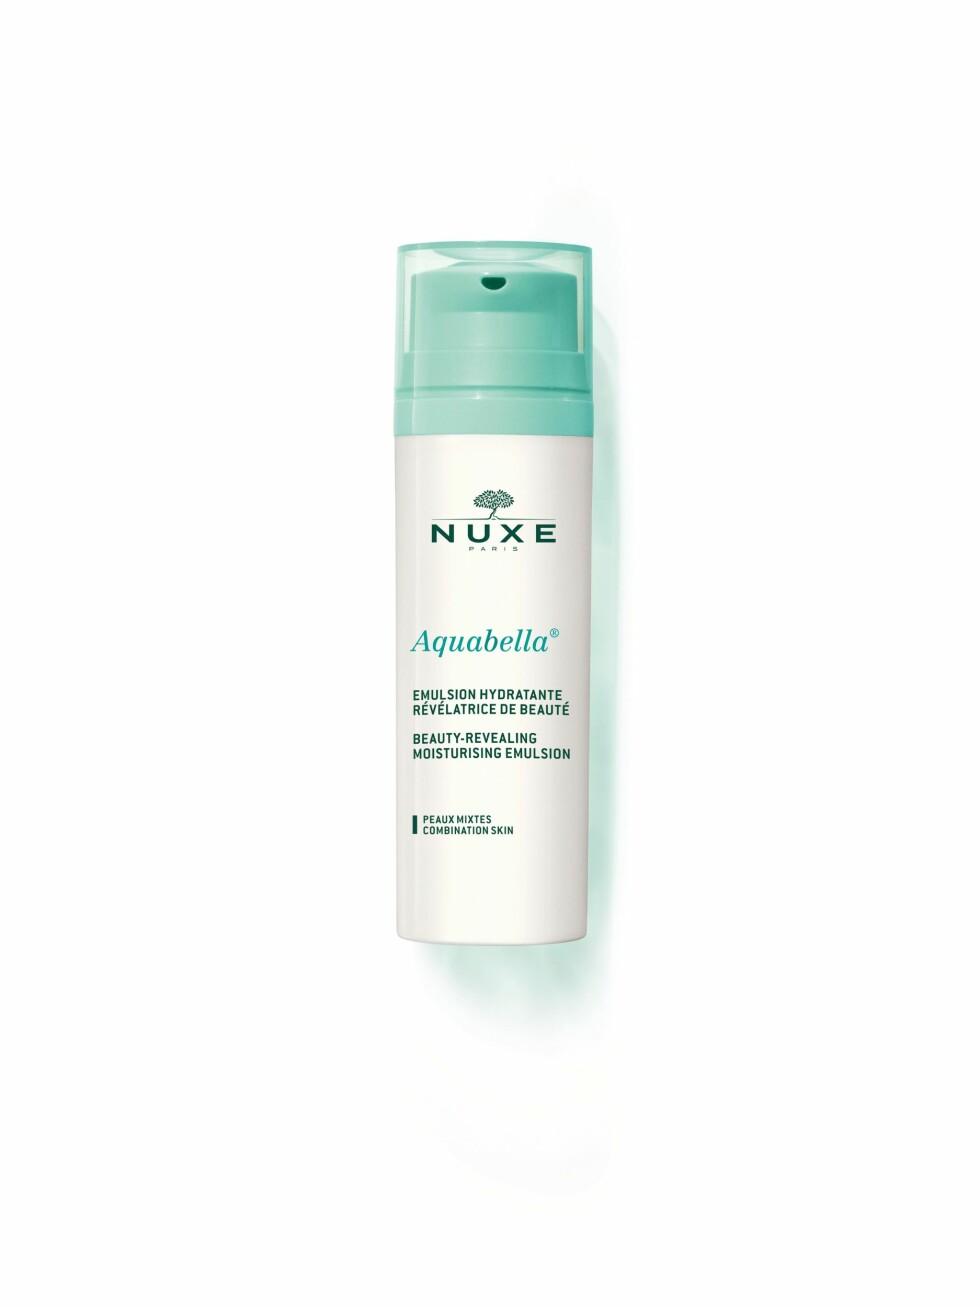 Moisturising Emulsion Ansiktskrem  | Aquabella | https://www.apotek1.no/produkter/nuxe-aquabella-moisturising-emulsion-ansiktskrem-852874p?utm_source=KK.no&utm_medium=Advetorial&utm_campaign=Nuxe%20Aquabella